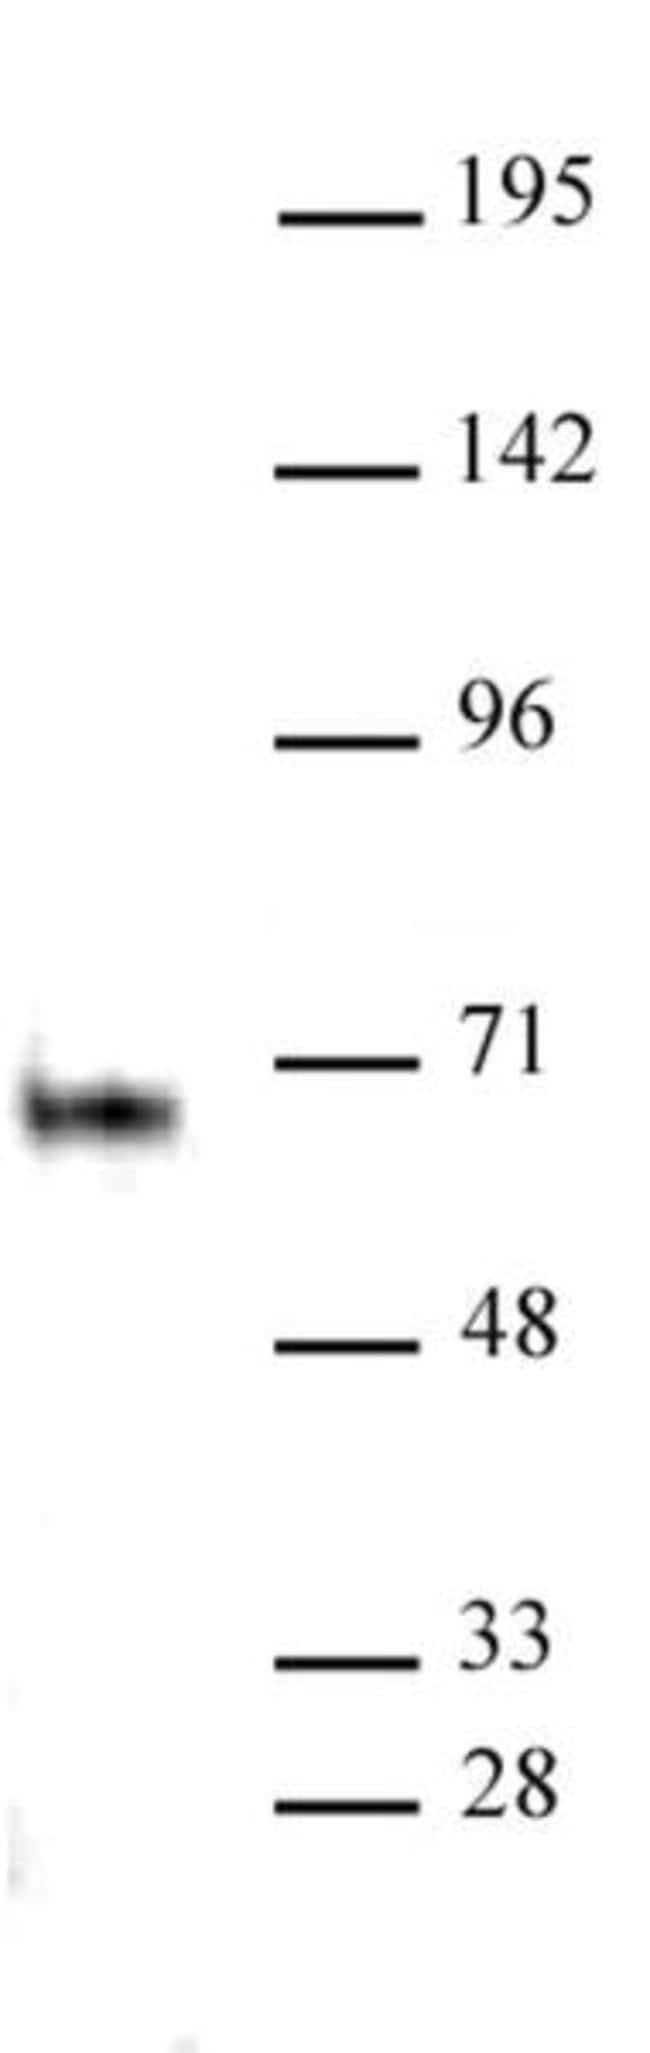 Elk-1 Rabbit anti-Human, Unconjugated, Polyclonal, Active Motif:Antibodies:Primary